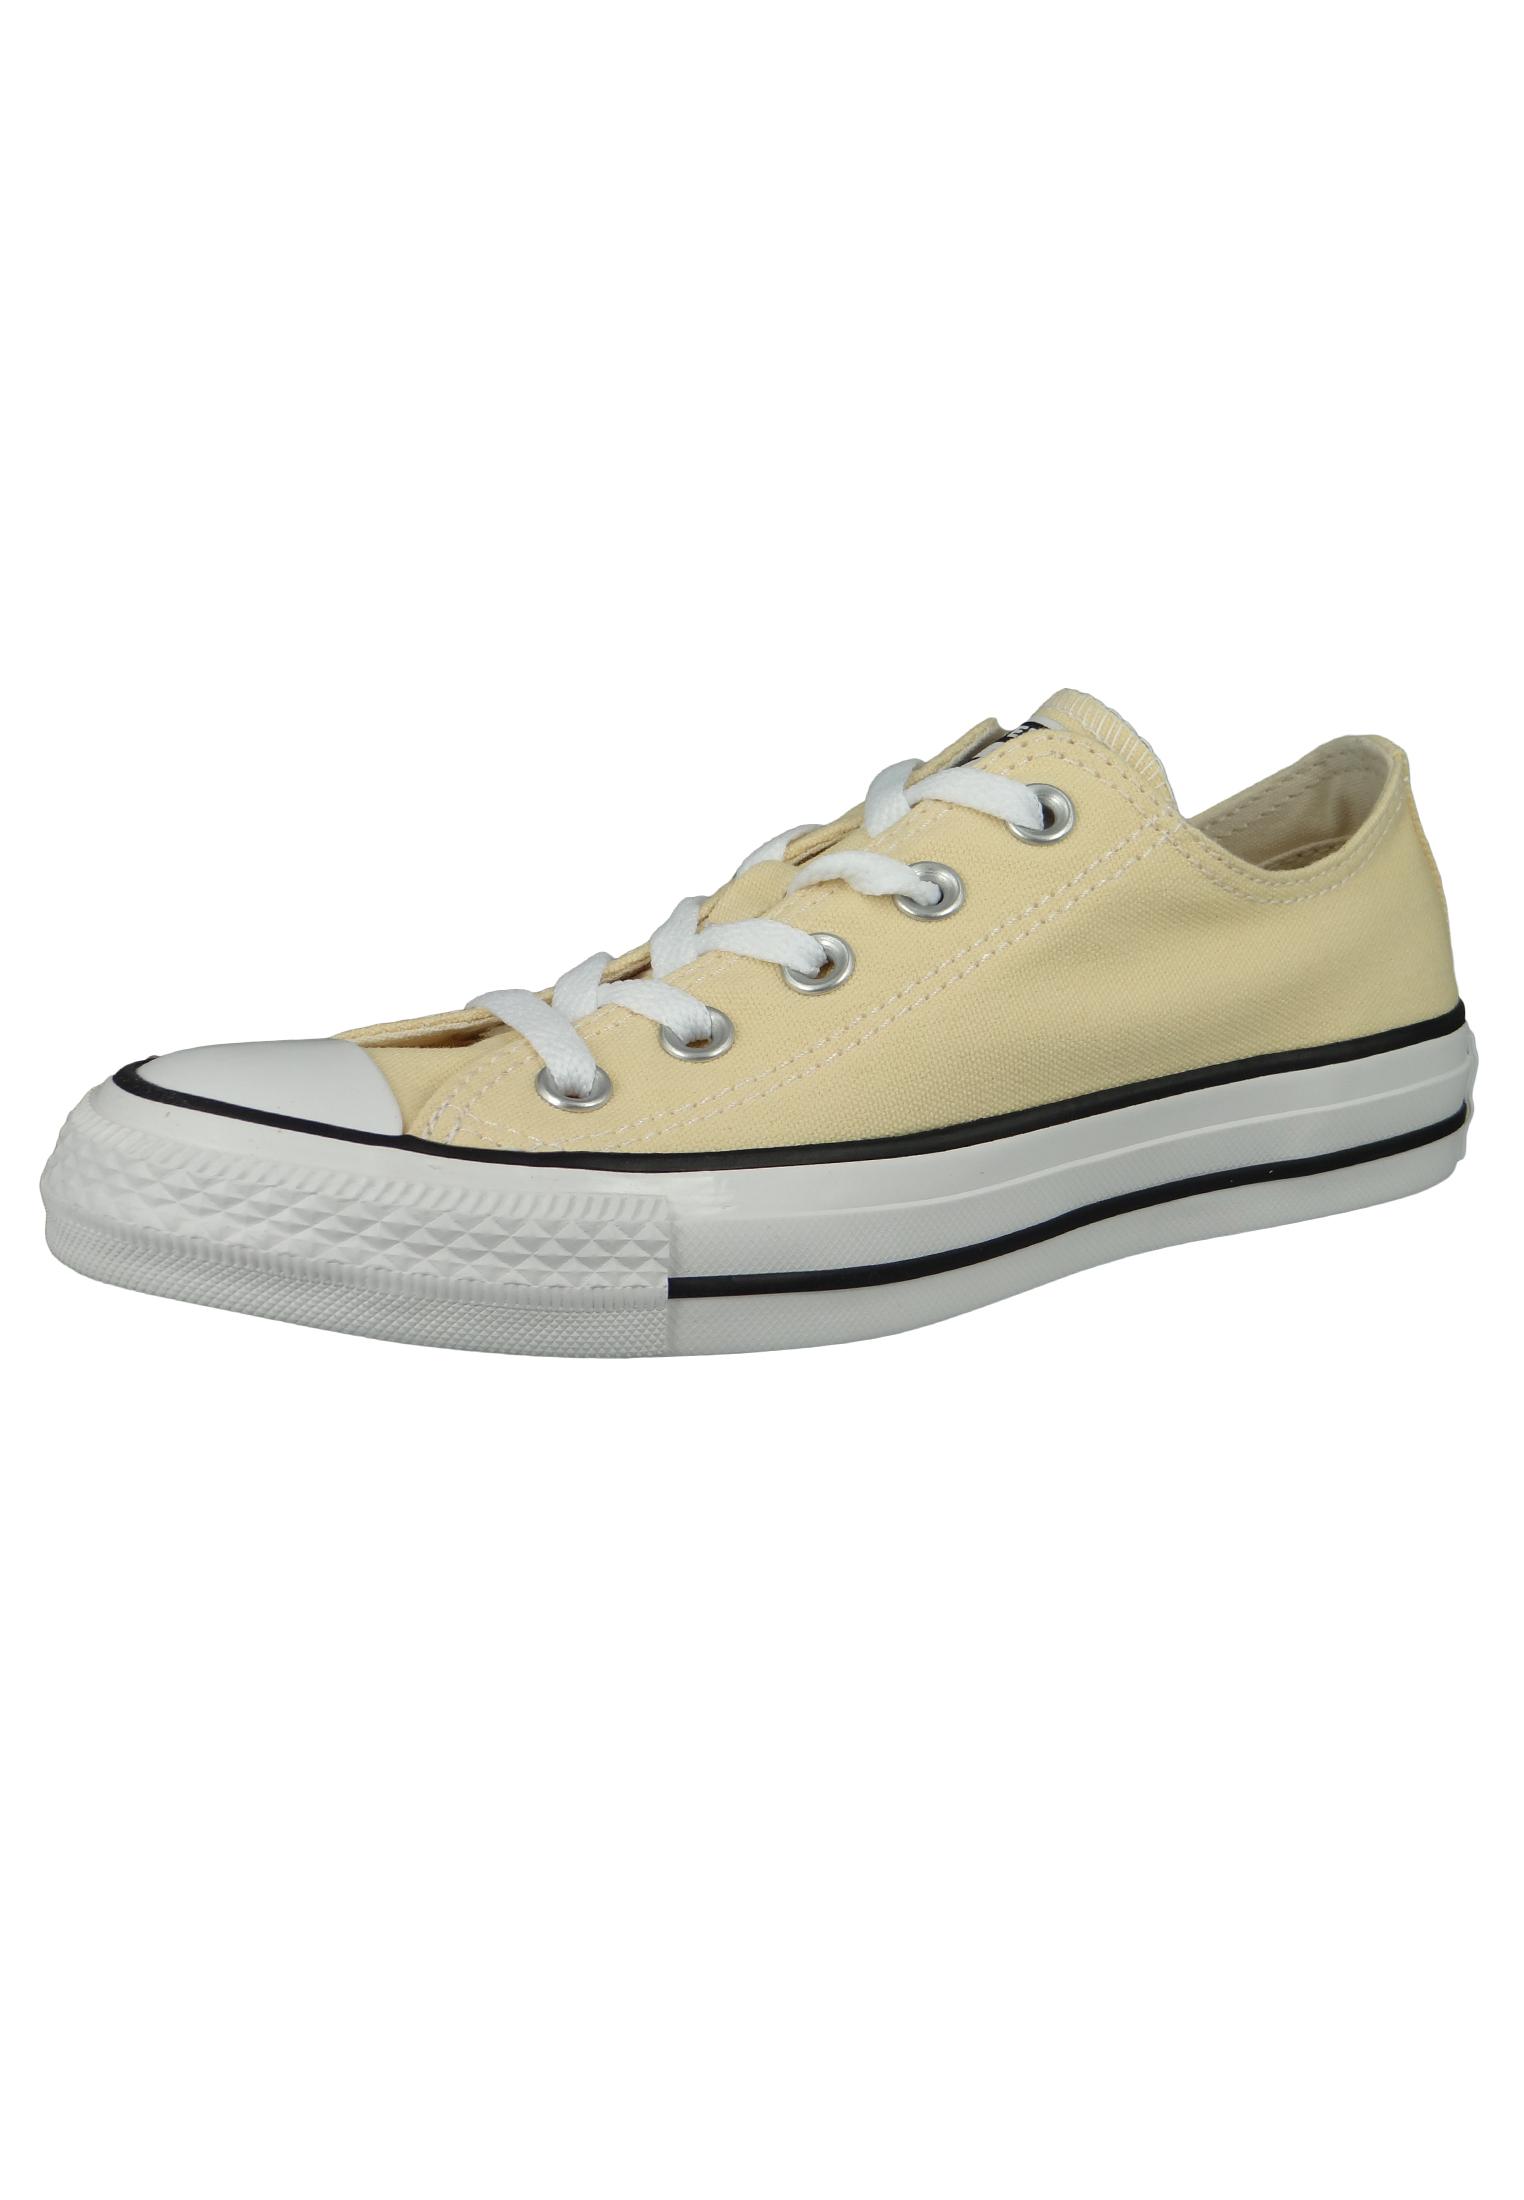 Converse Chucks Beige 164295C Chuck Taylor All Star - OX Pale Vanilla